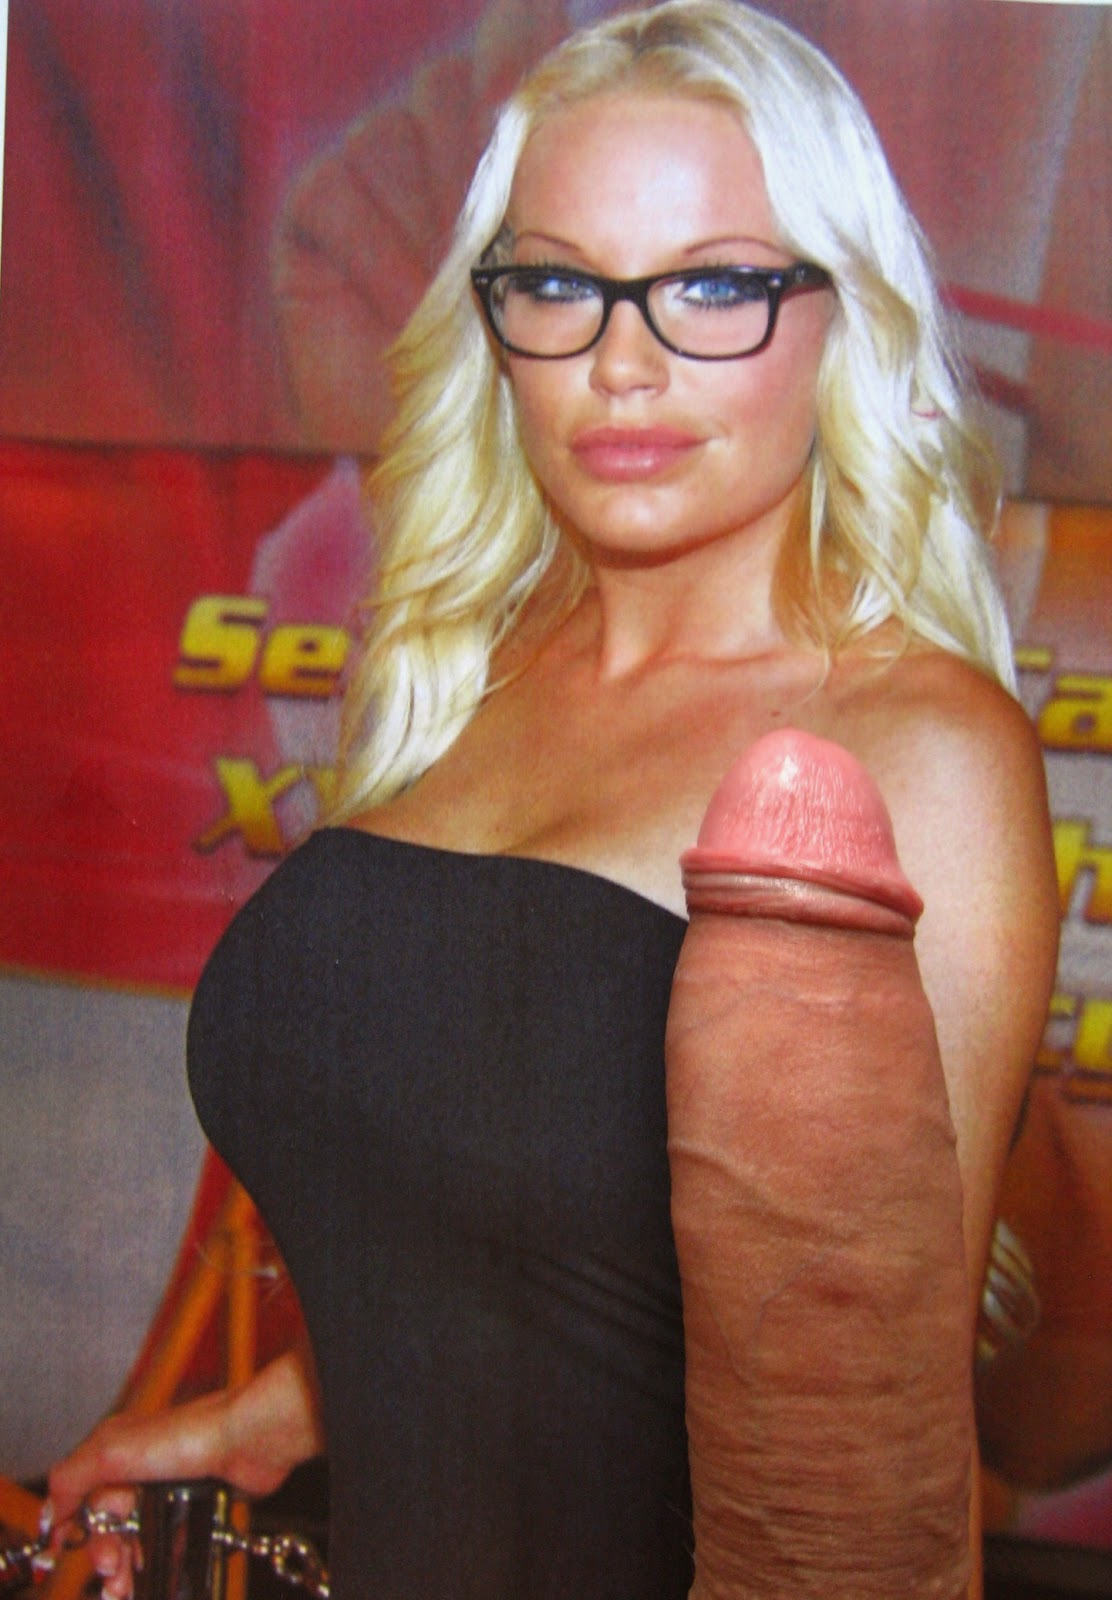 Gina lisa lohfink porn tube